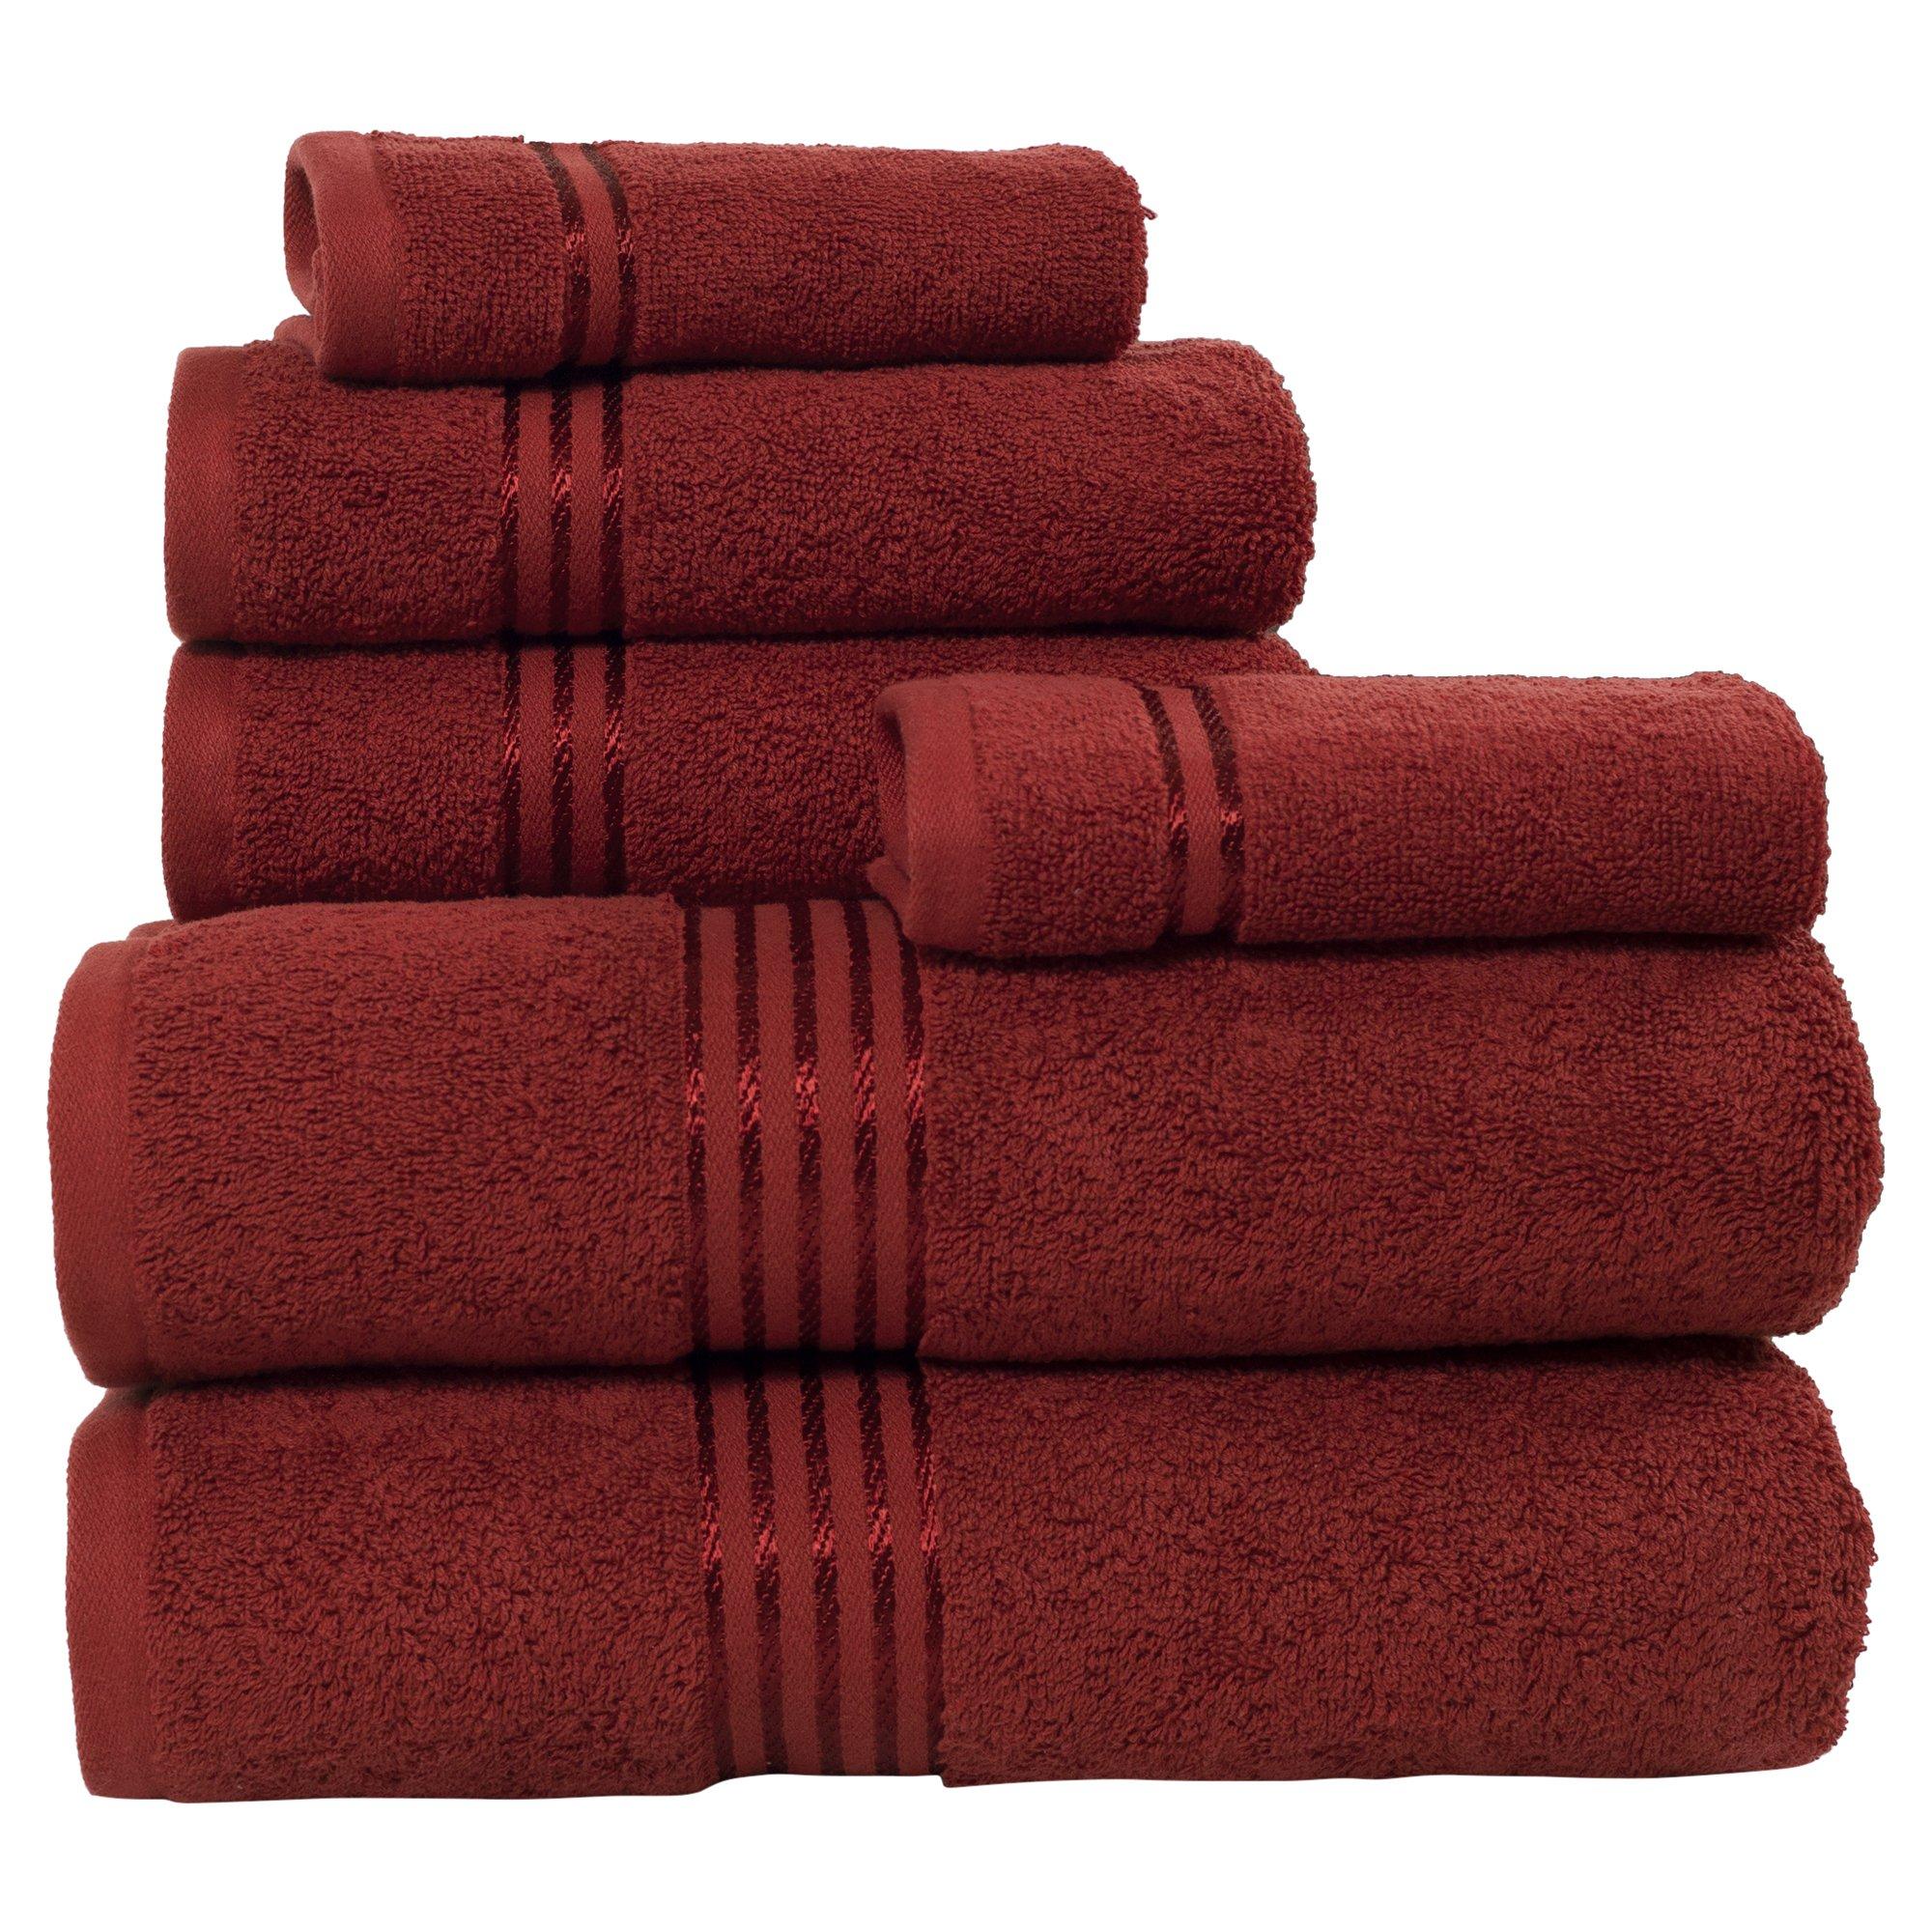 Lavish Home 100% Cotton Hotel 6 Piece Towel Set - Burgundy